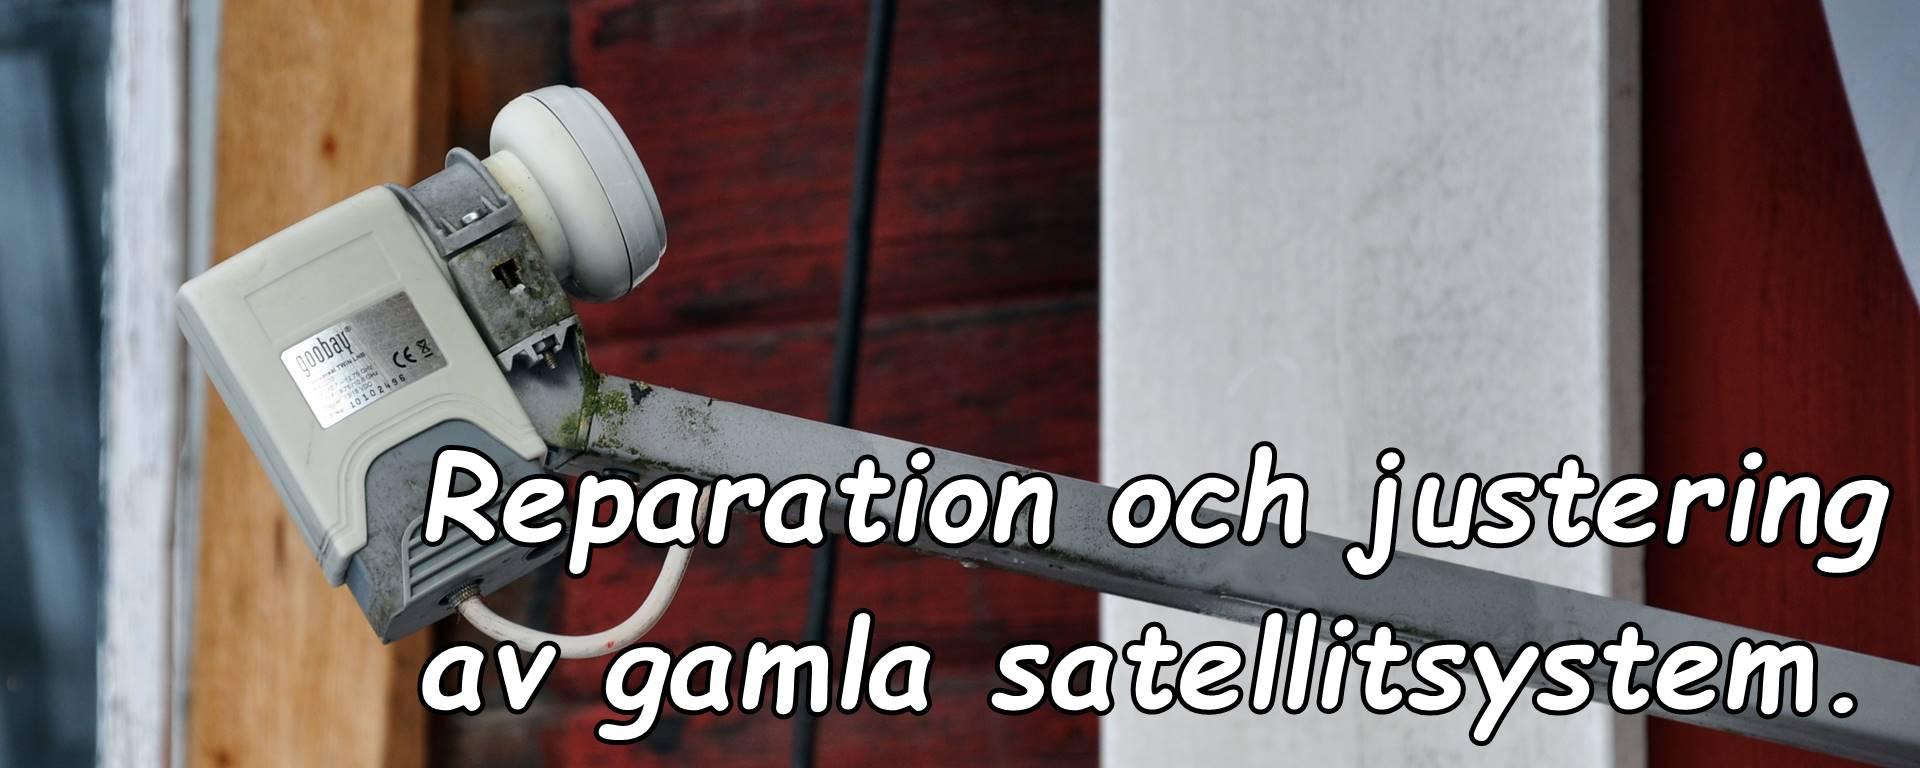 20190315-CD-service-Missens-gamla-LNB